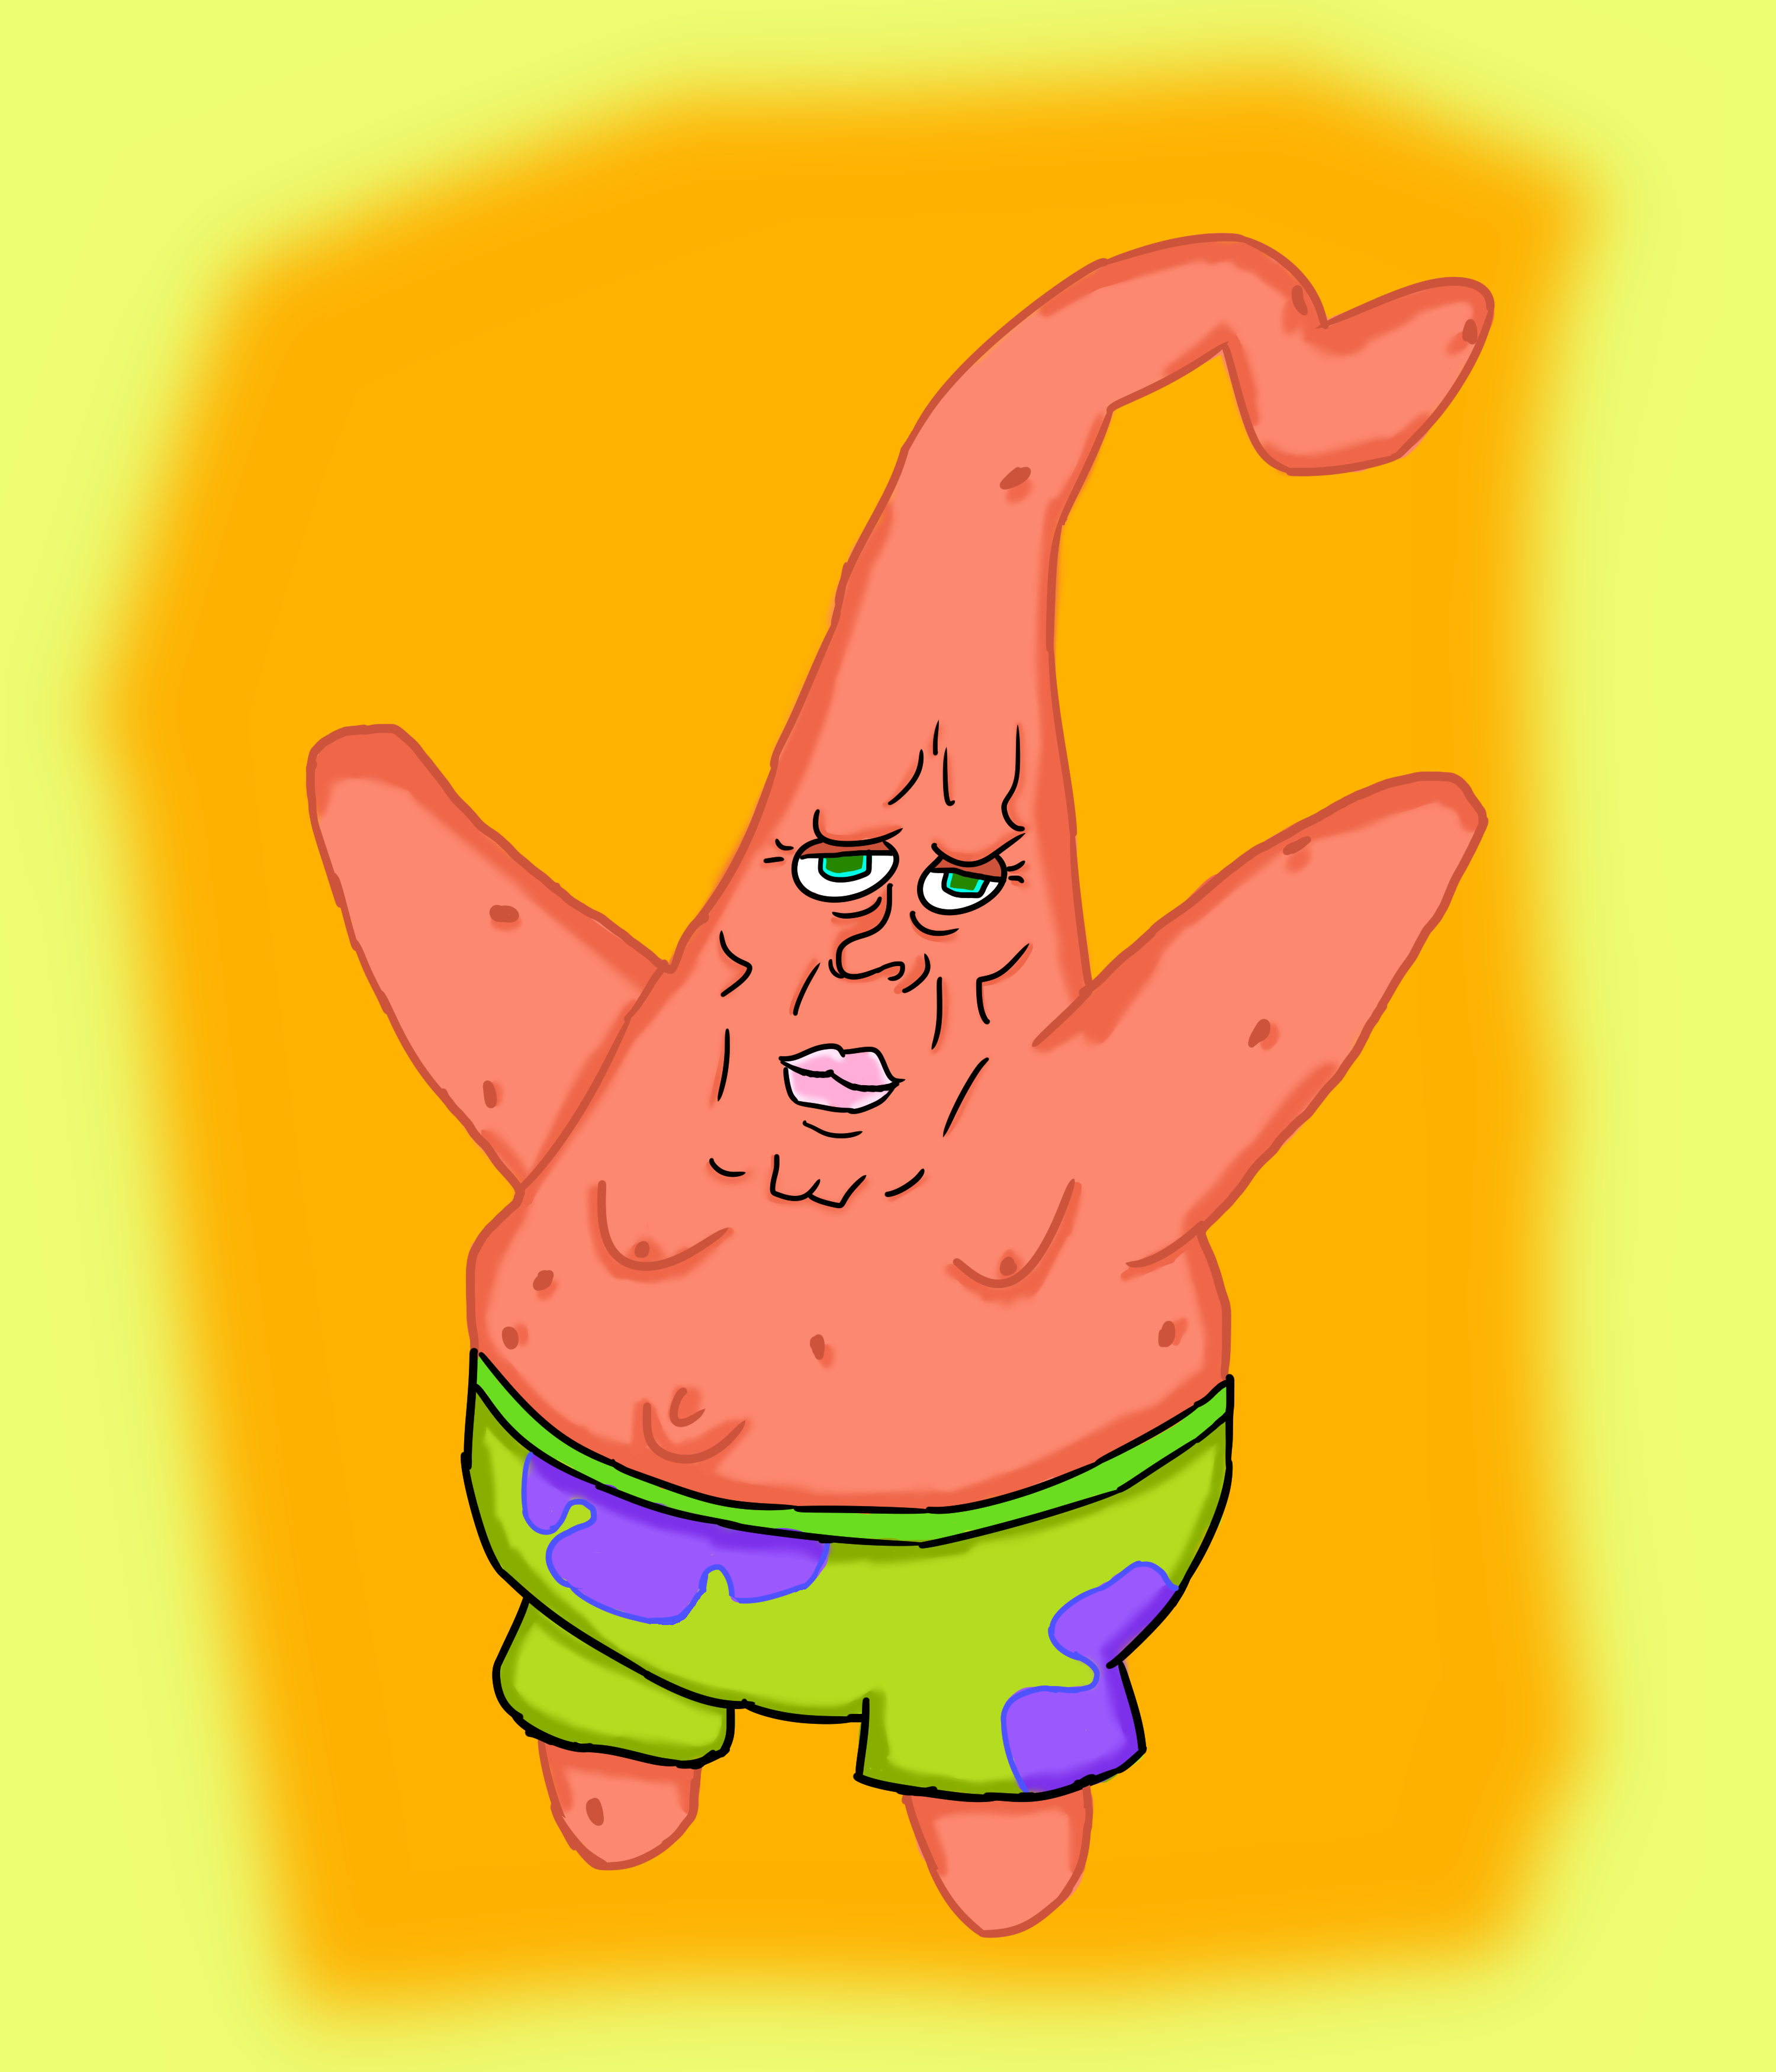 Patrick is a cutie